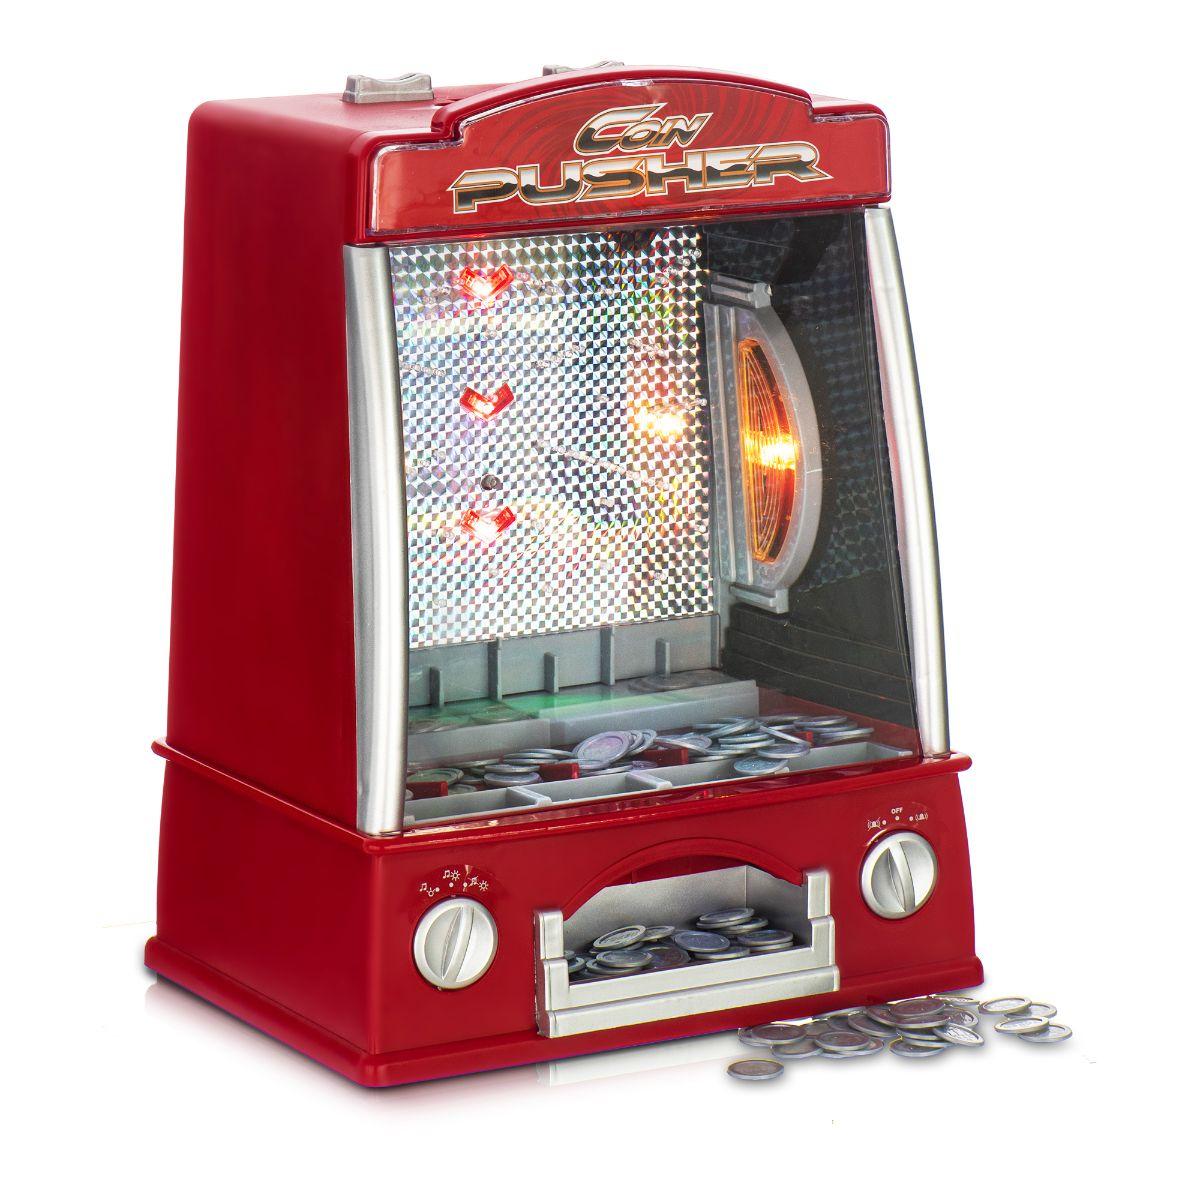 Toy slot machines uk petz hamsterz 2 game boy advance